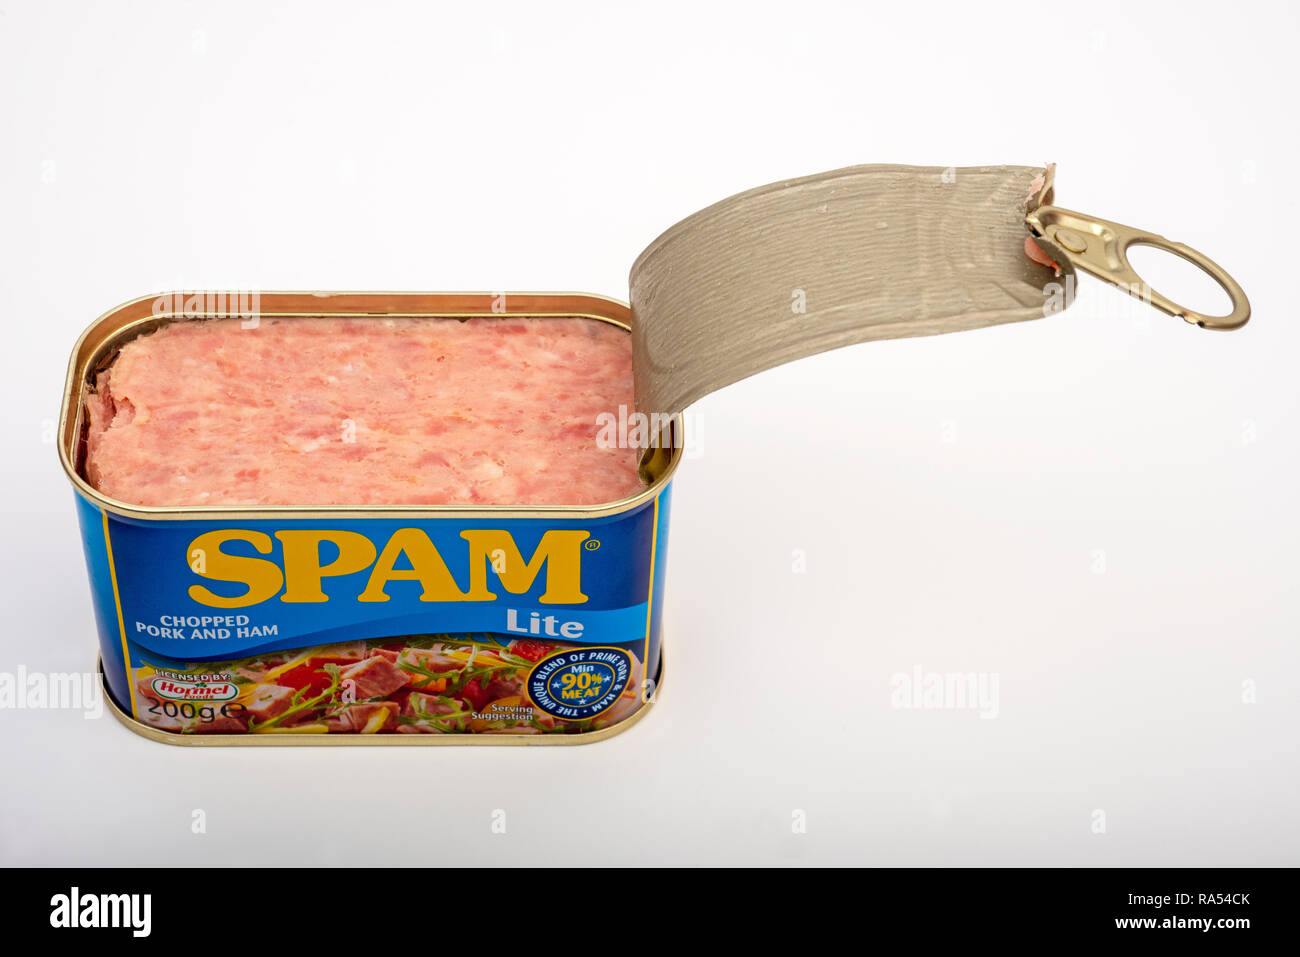 Spam Lite chopped pork and ham - Stock Image